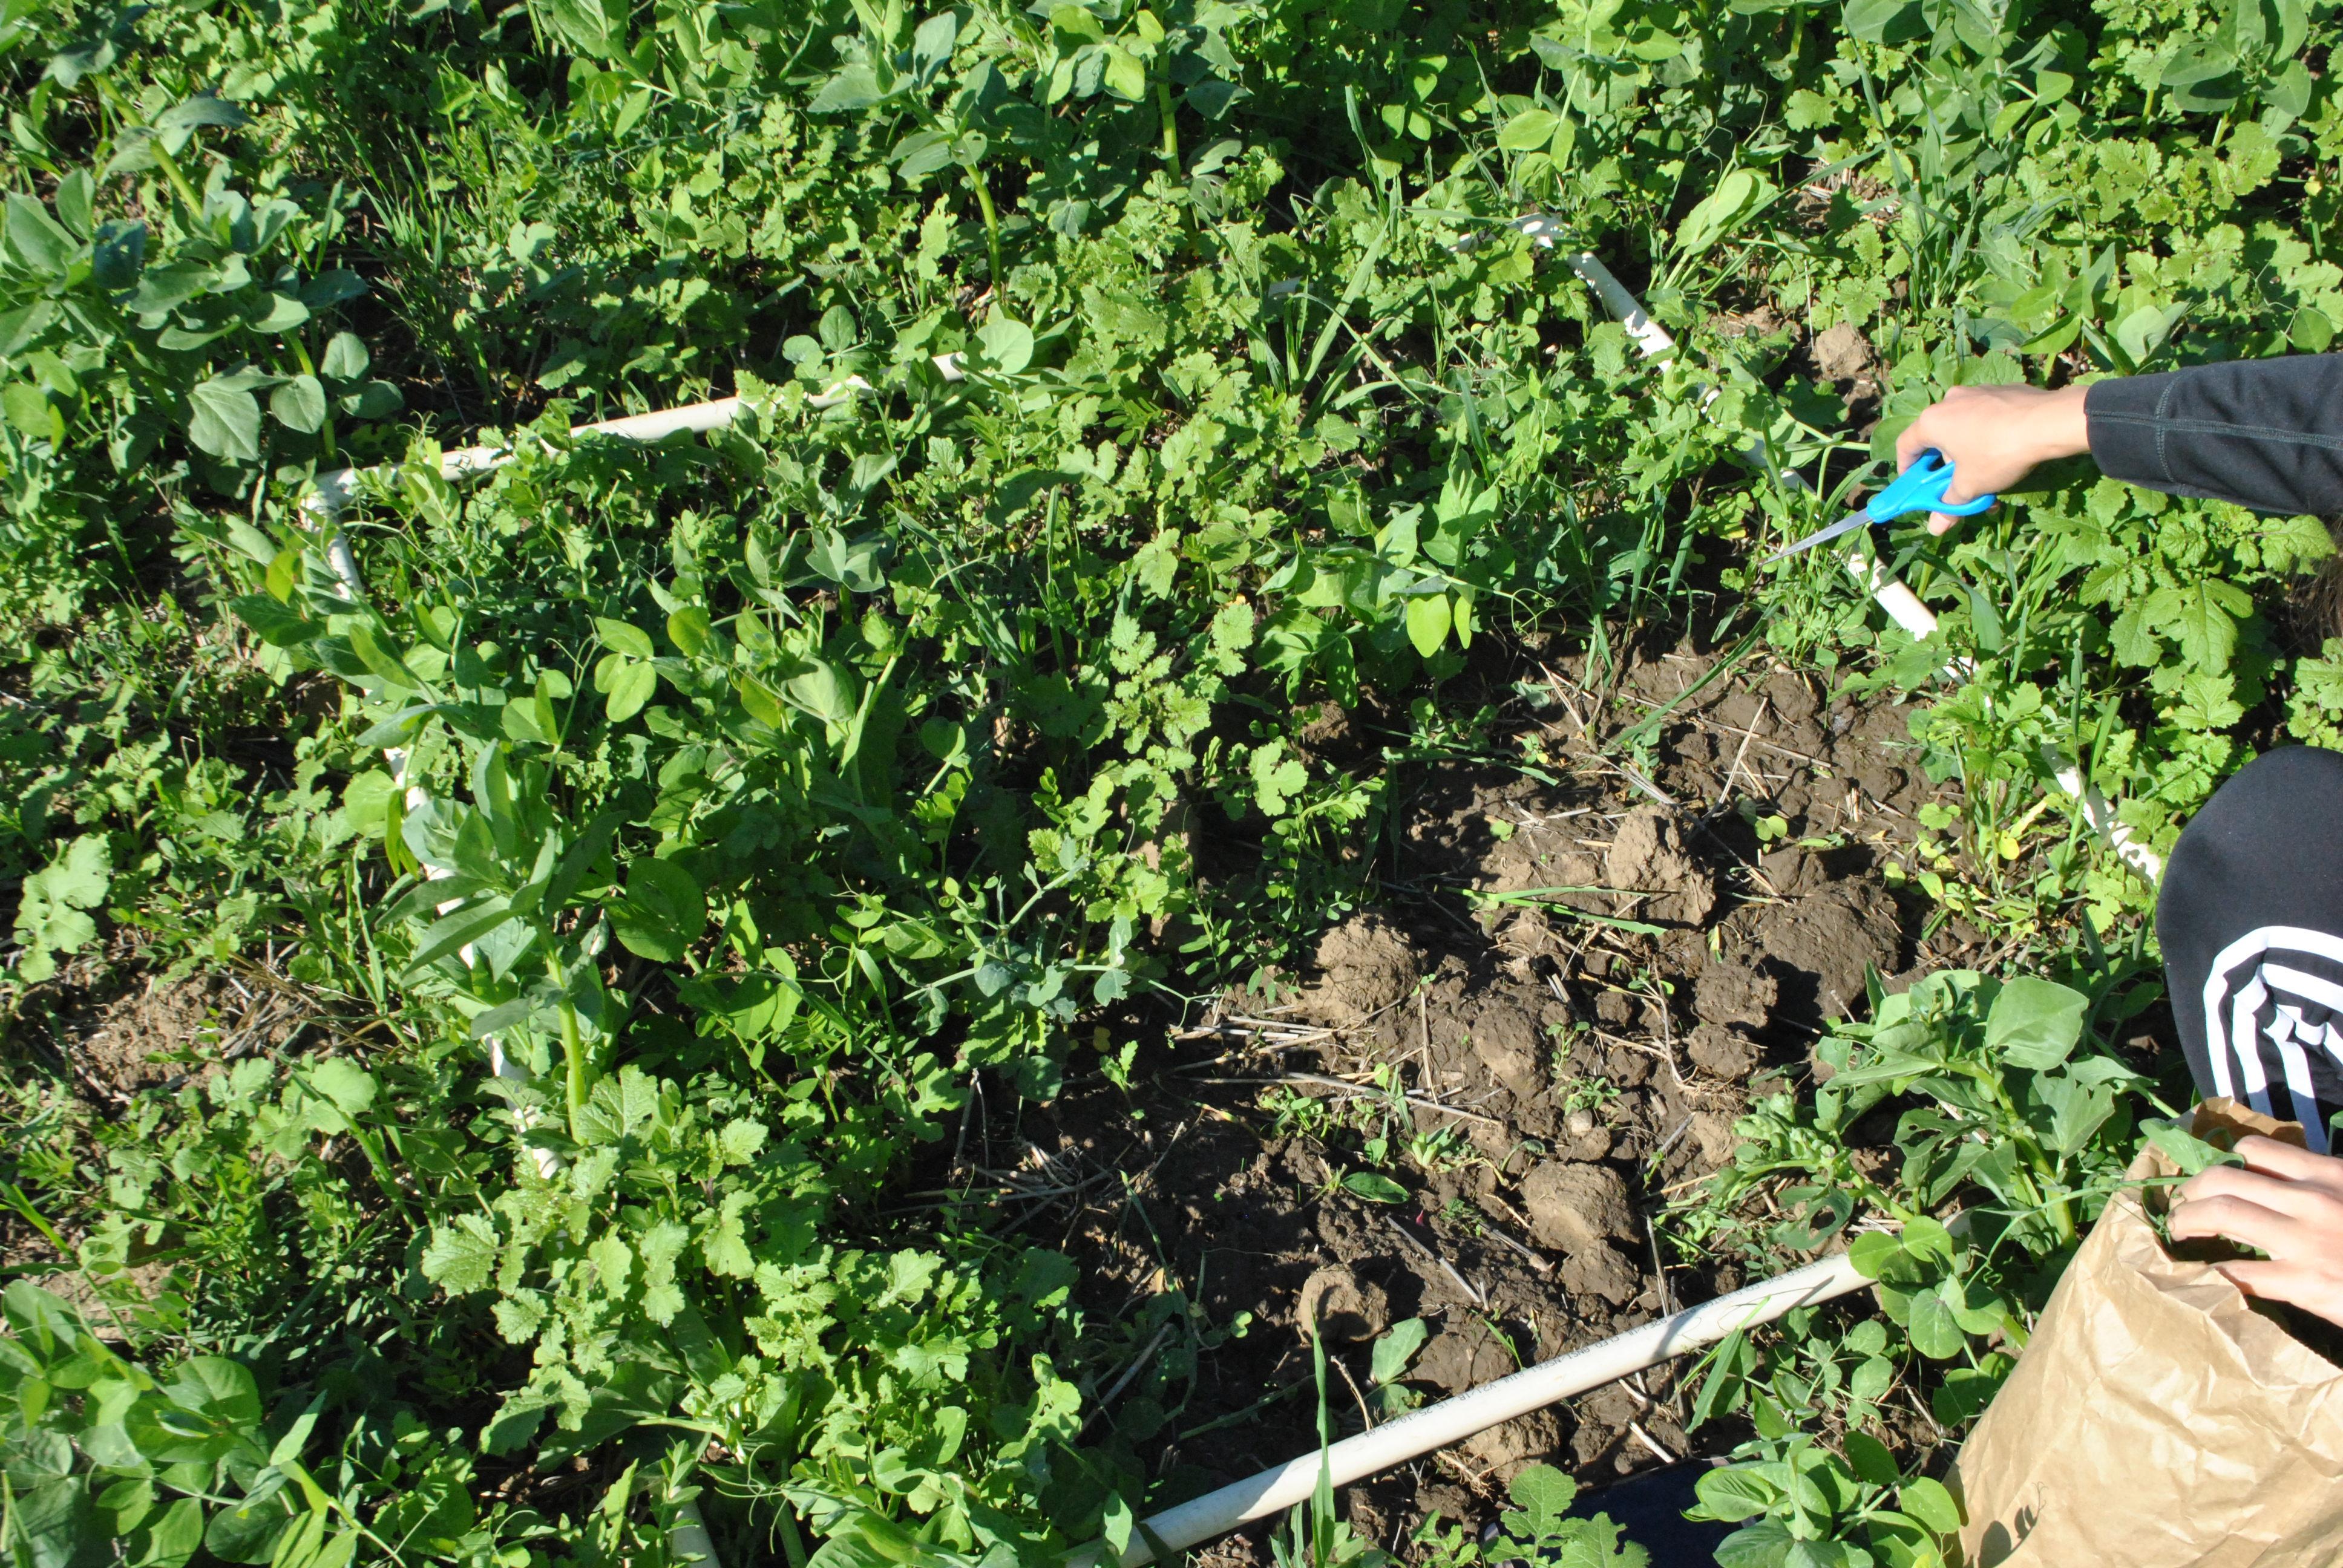 Winter pea-radish cover crop